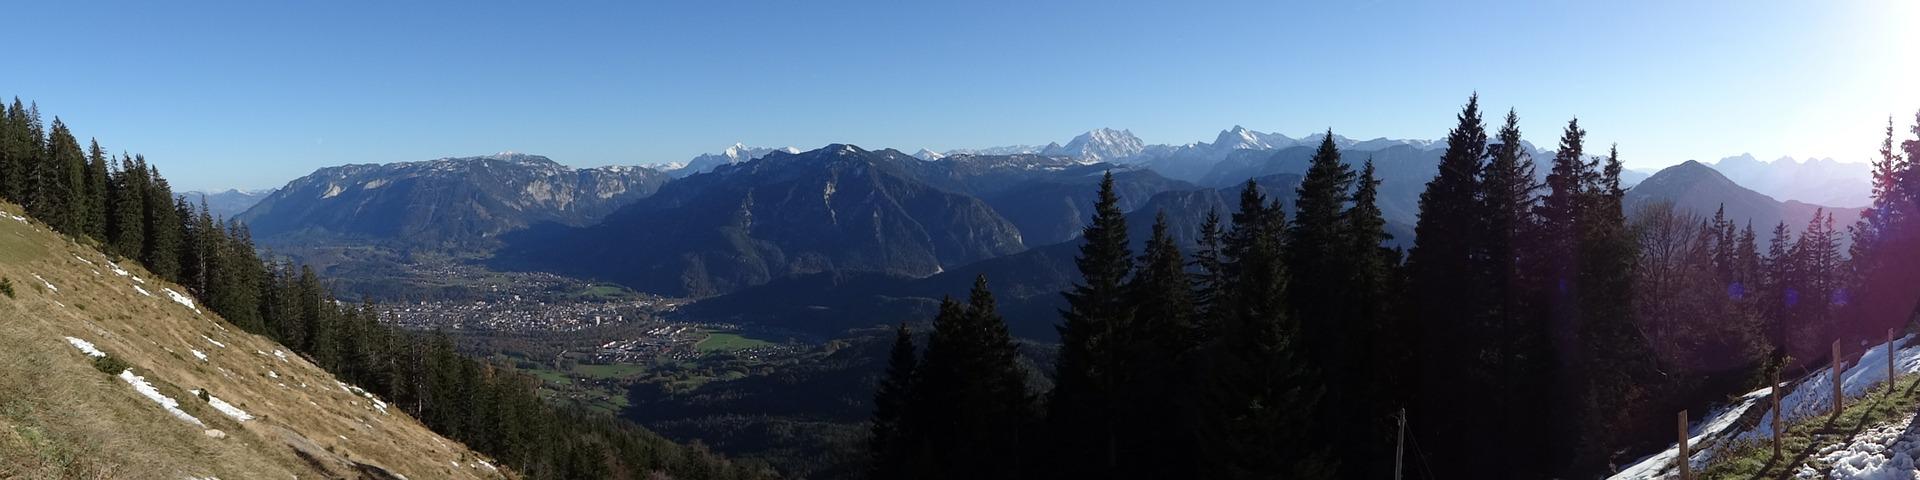 Quelle: https://pixabay.com/de/zwiesel-berge-alpen-bad-reichenhall-539918/